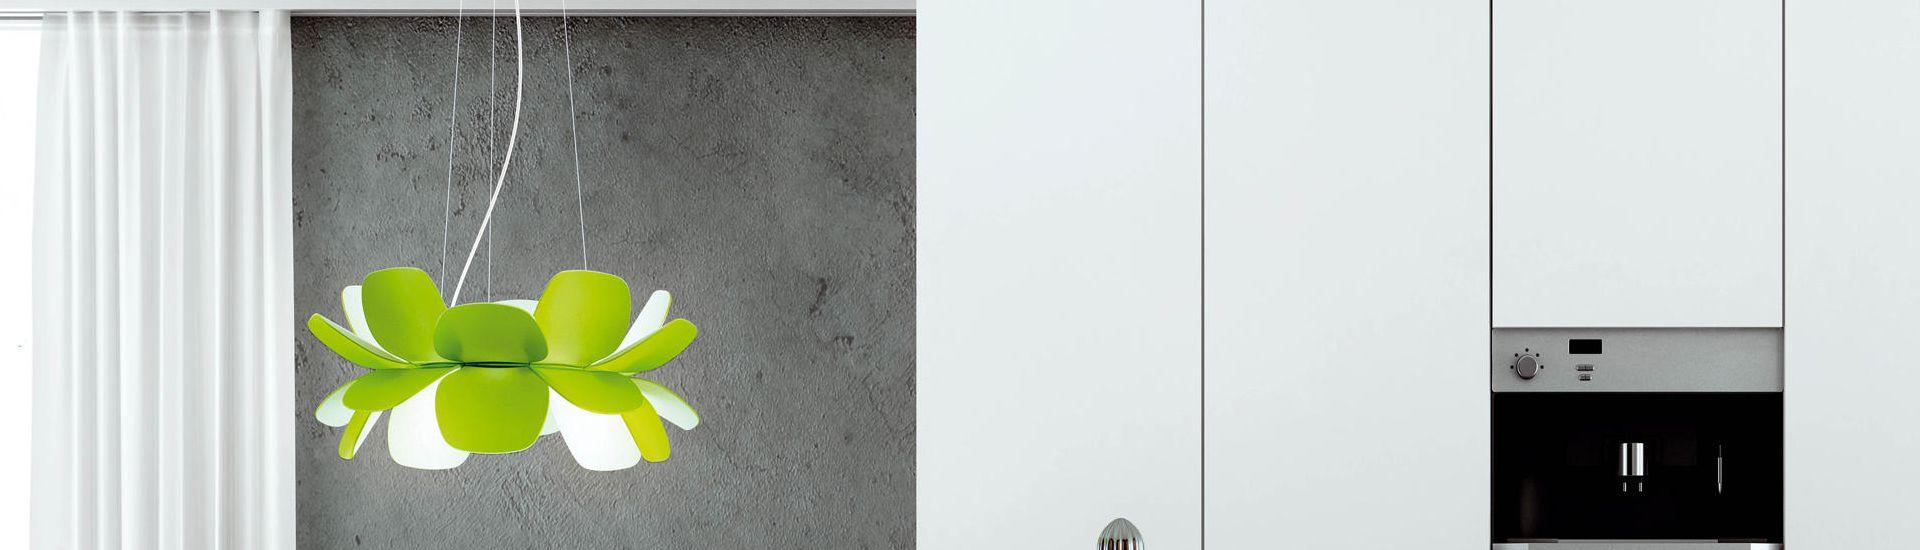 Infiore T 5805 Lampada a sospensione ECO 120W Verde